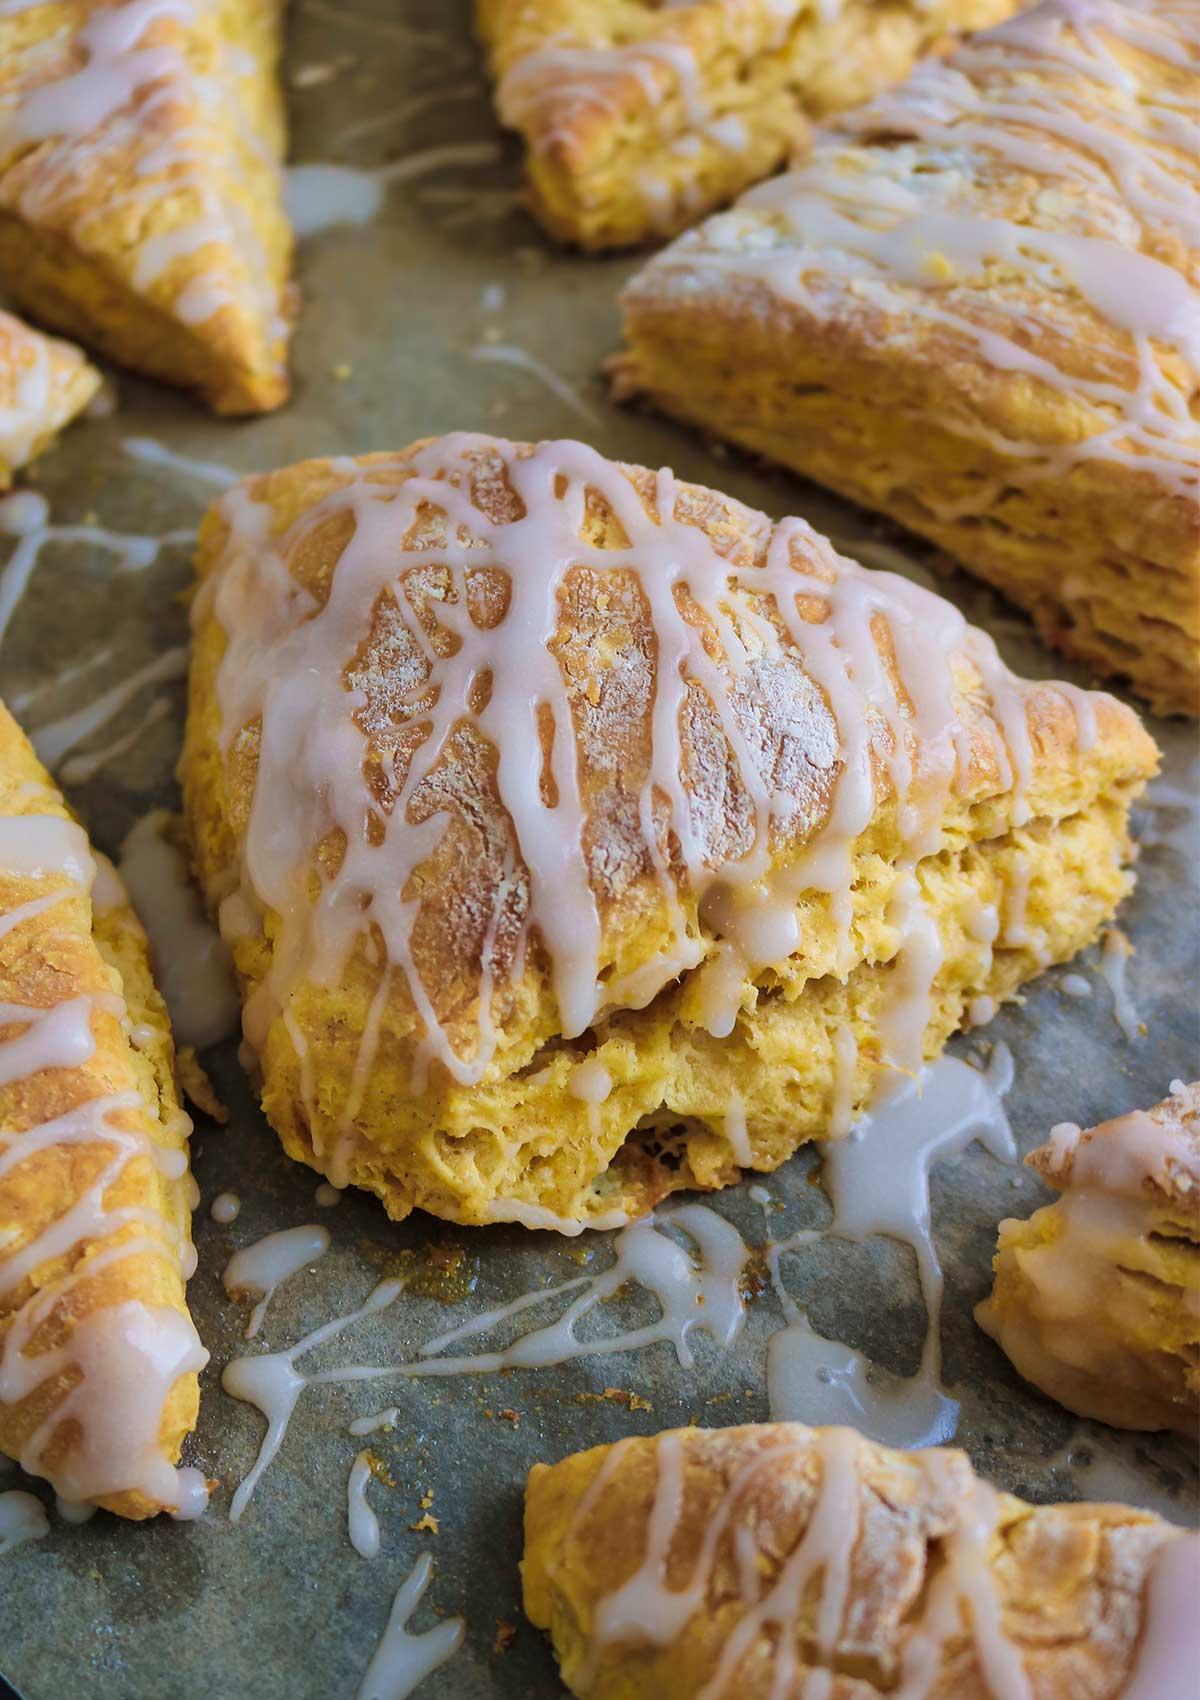 vegan pumpkin scones in baking tray ready to serve